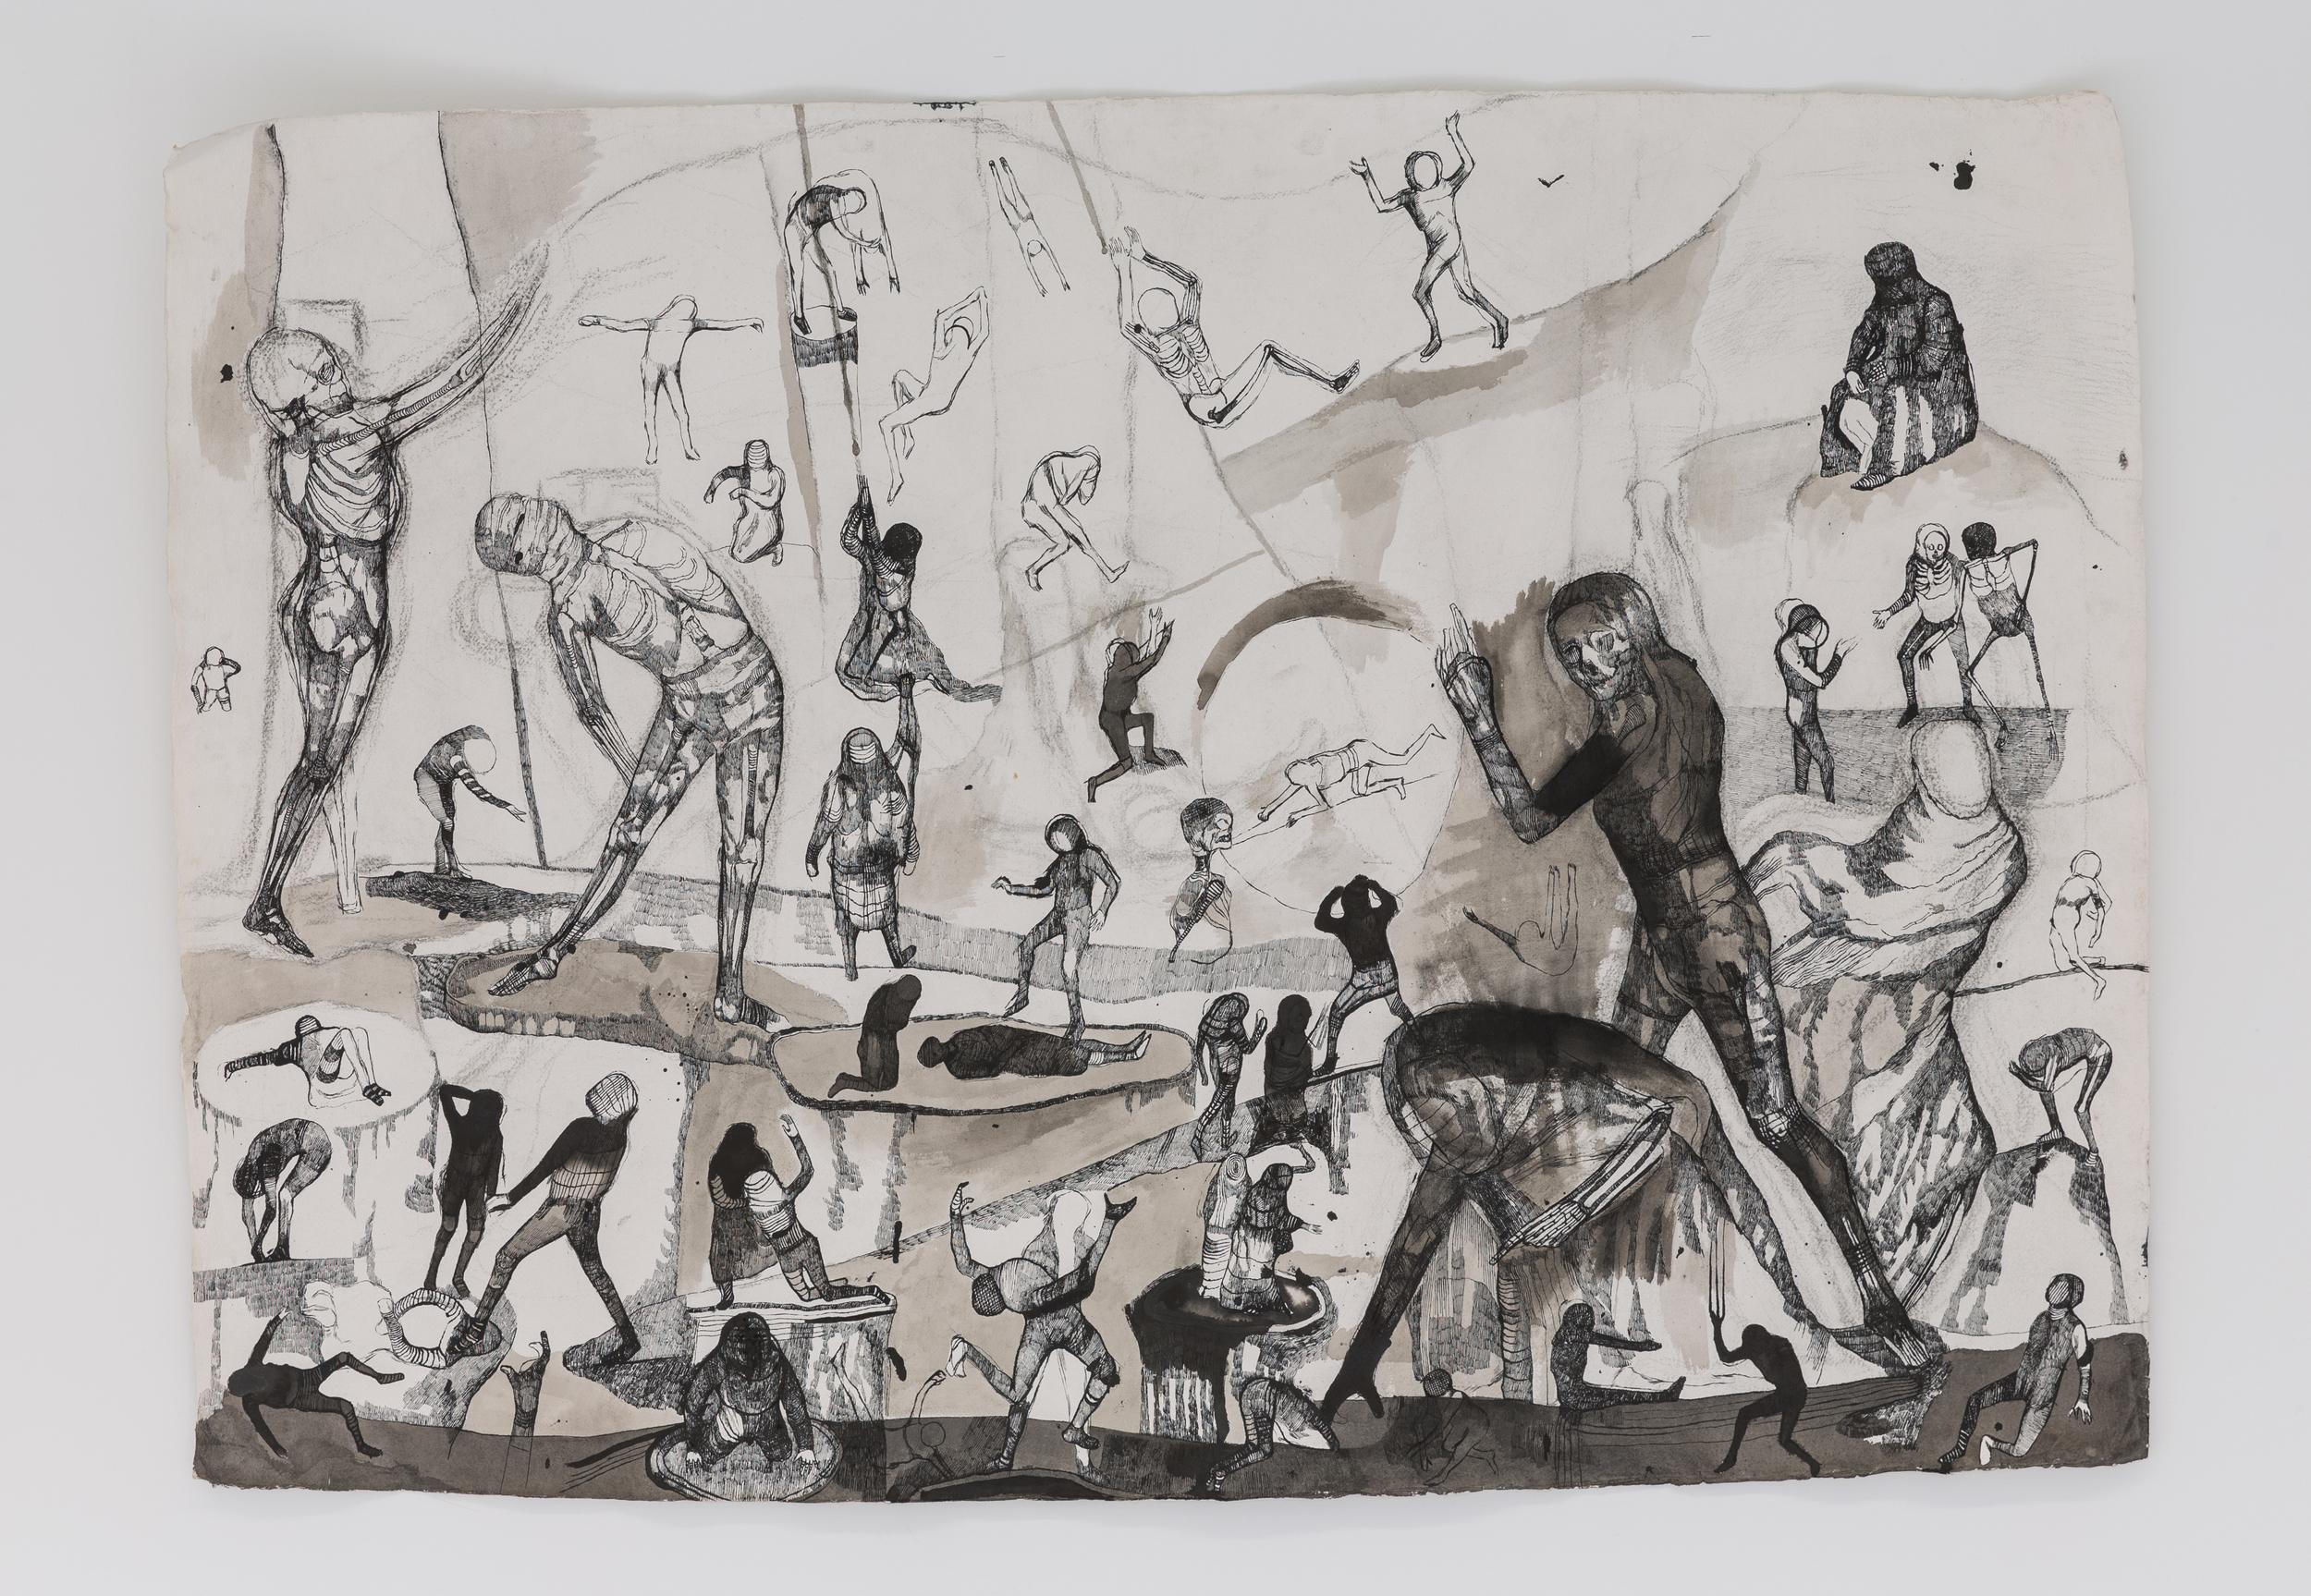 Josef Zlámal, bez názvu, 2012, tuš na ručním papíře, 140 x 100 cm